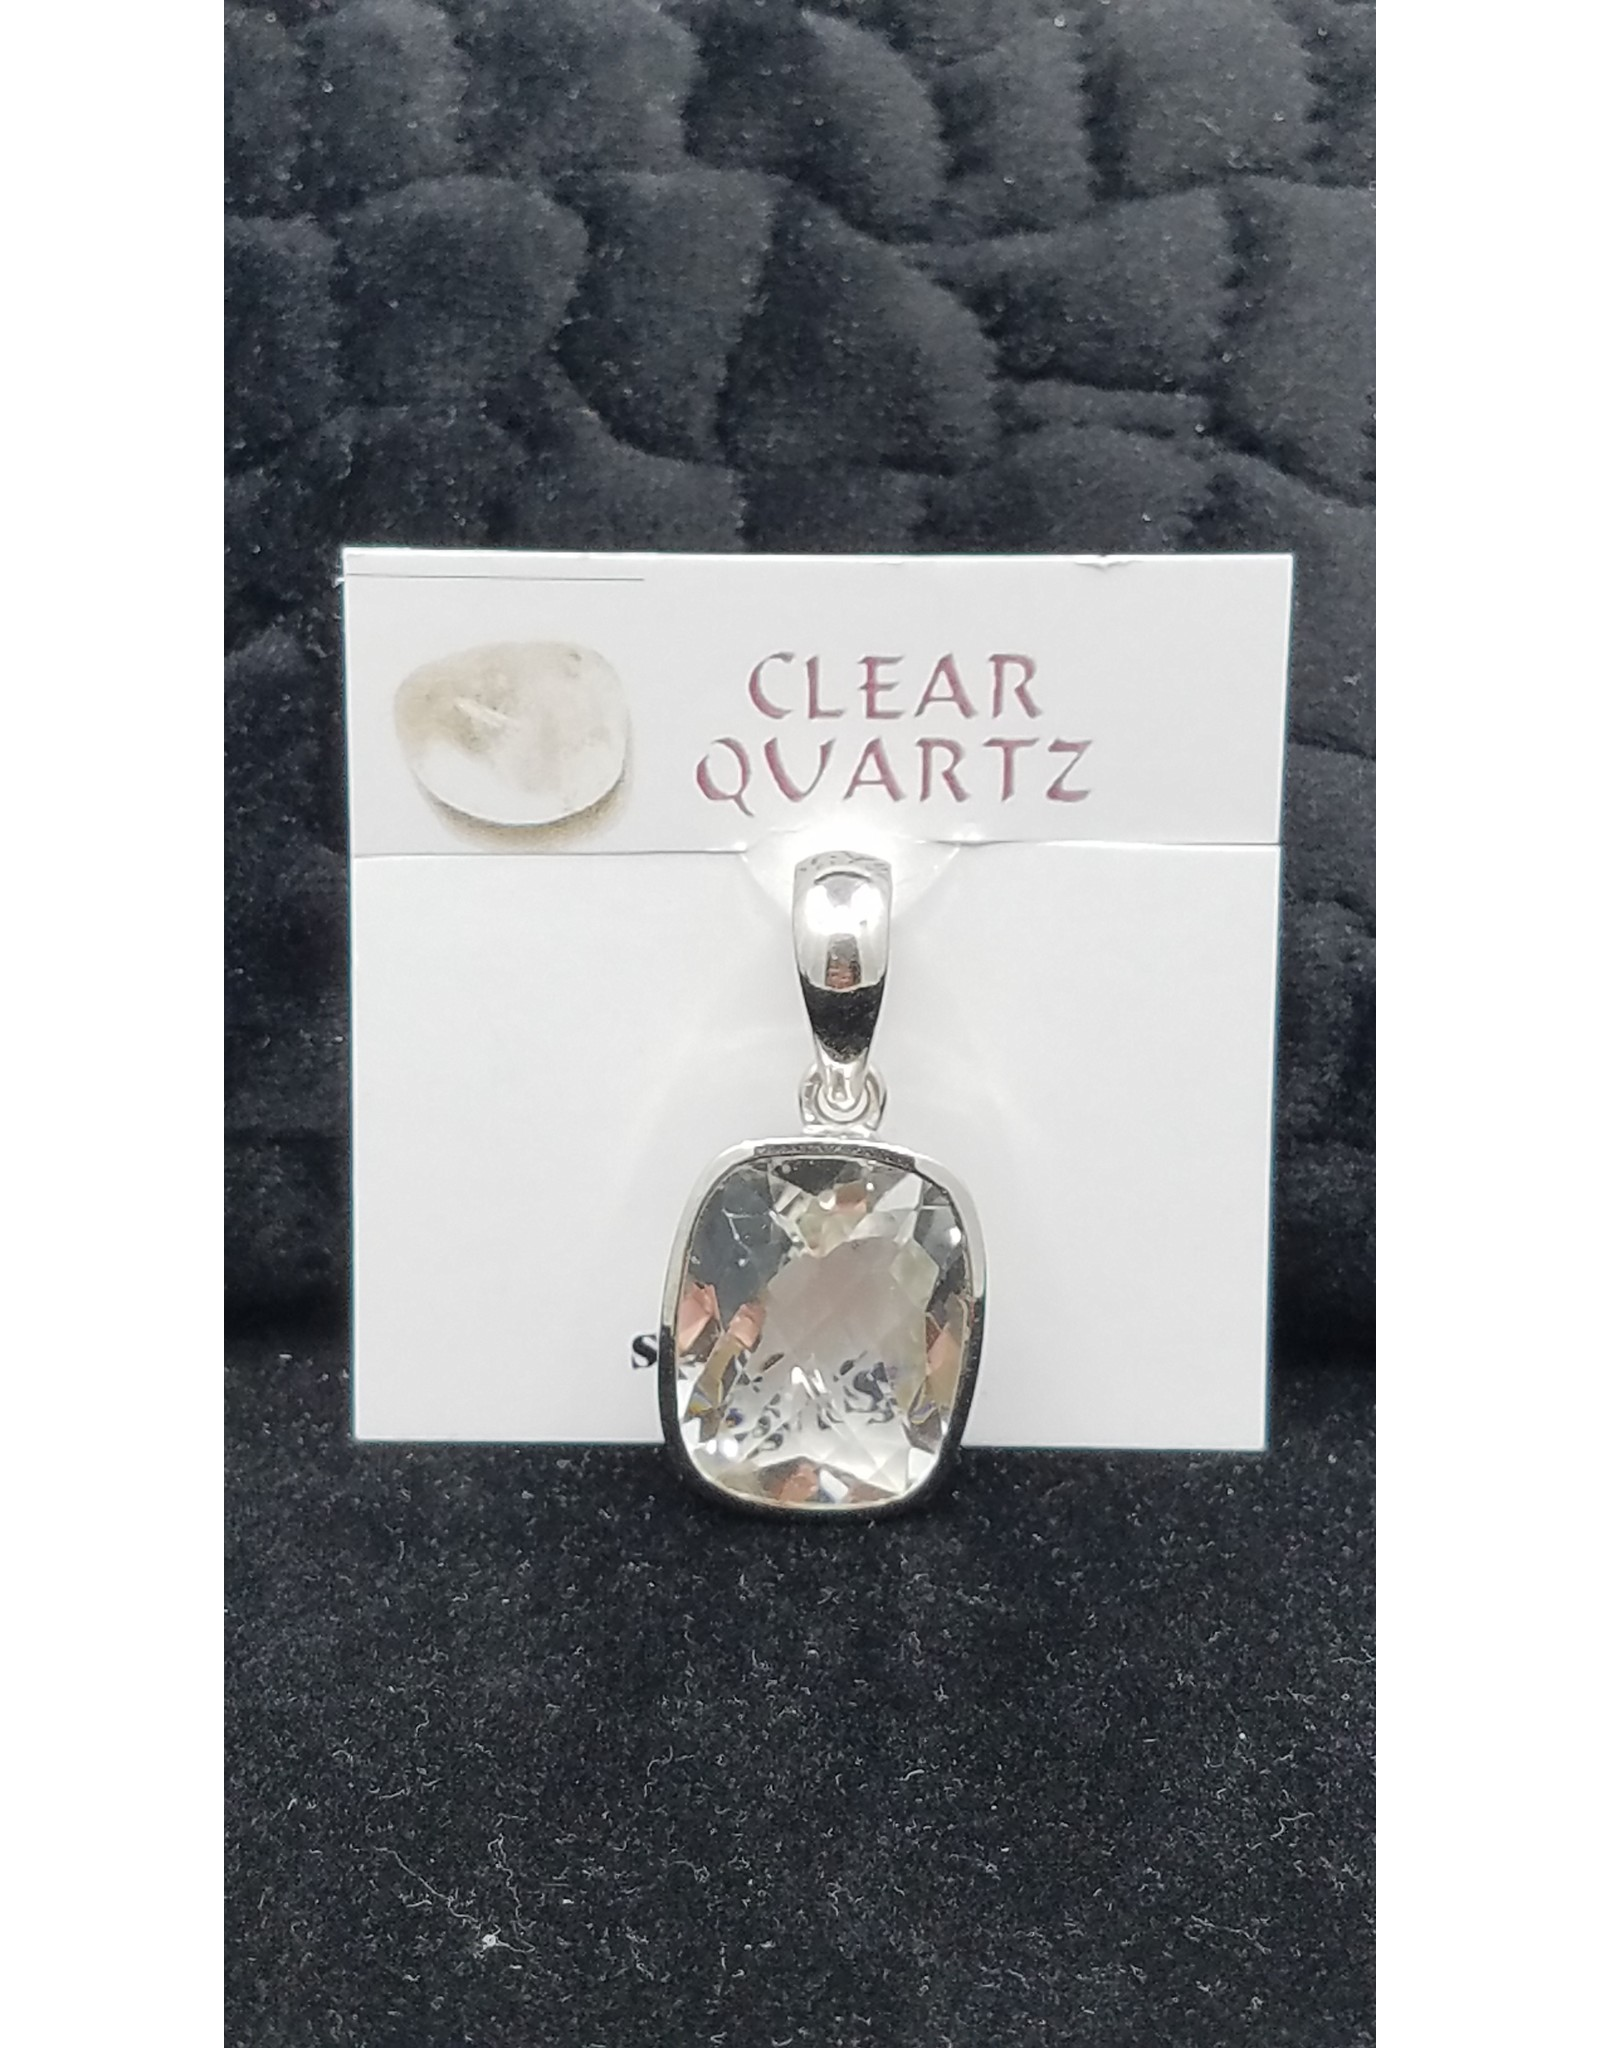 Clear Quartz Pendant